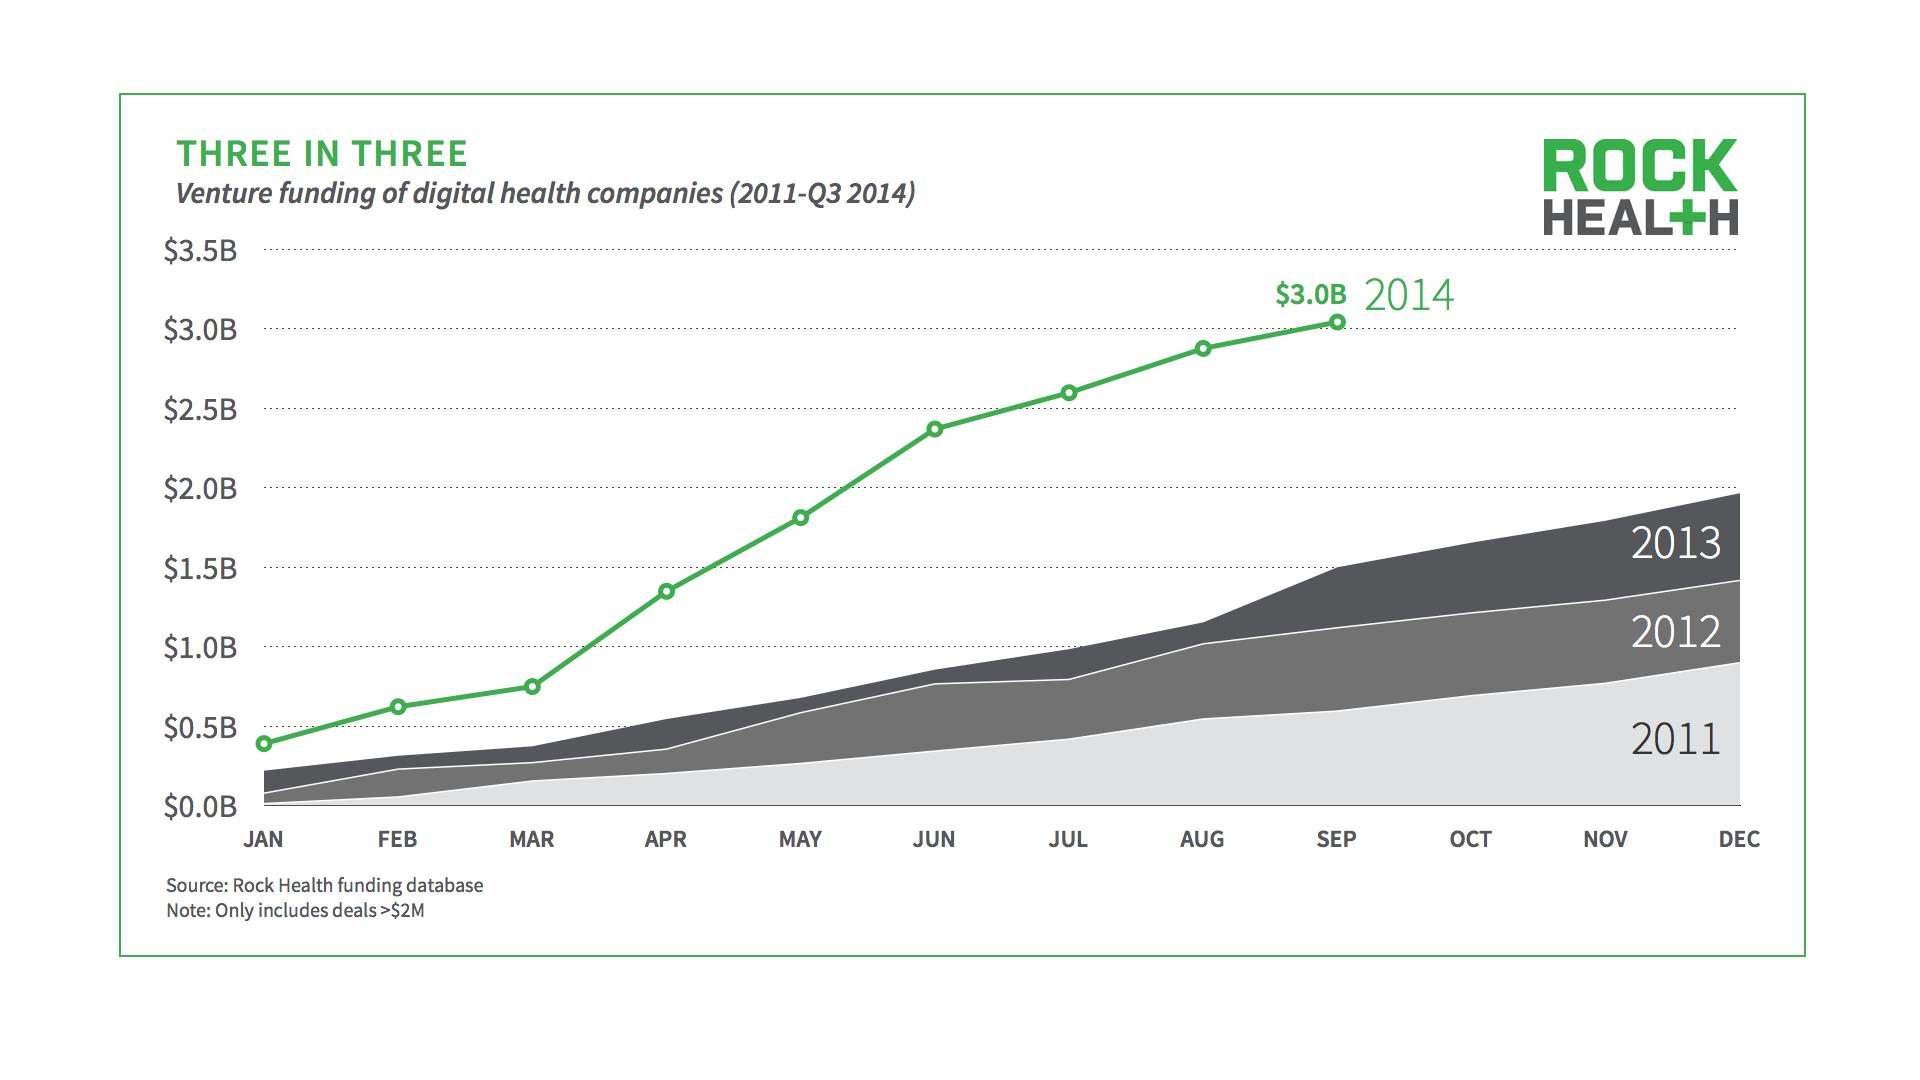 Digital Health Funding Surpasses Over $3B in Q3 of 2014